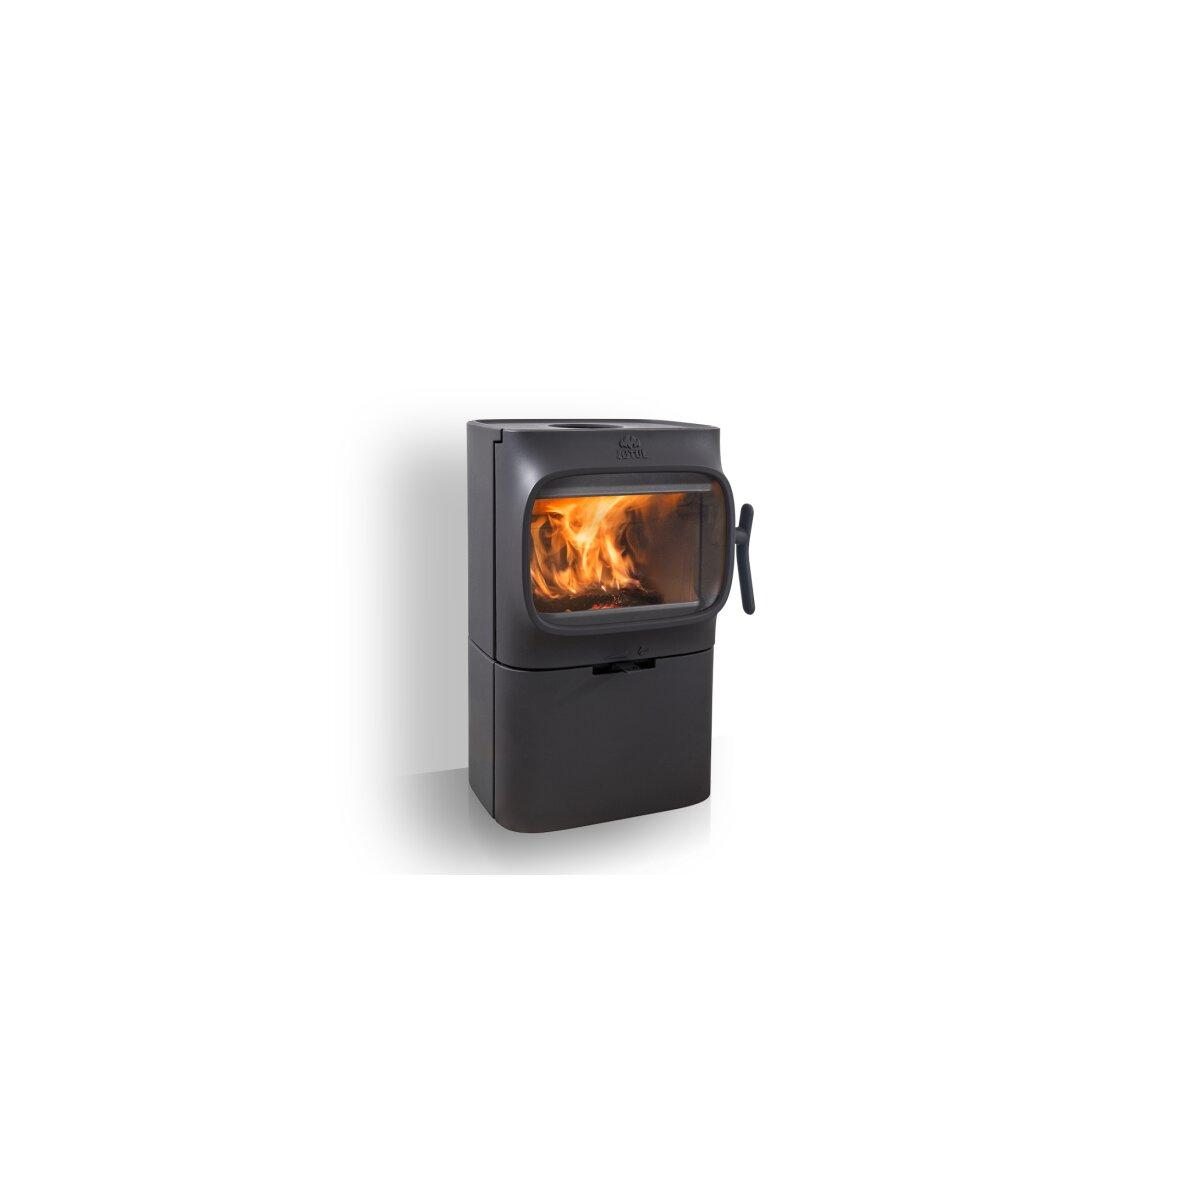 kaminofen gussofen jotul f 105 b 4 5 kw mit sockel. Black Bedroom Furniture Sets. Home Design Ideas